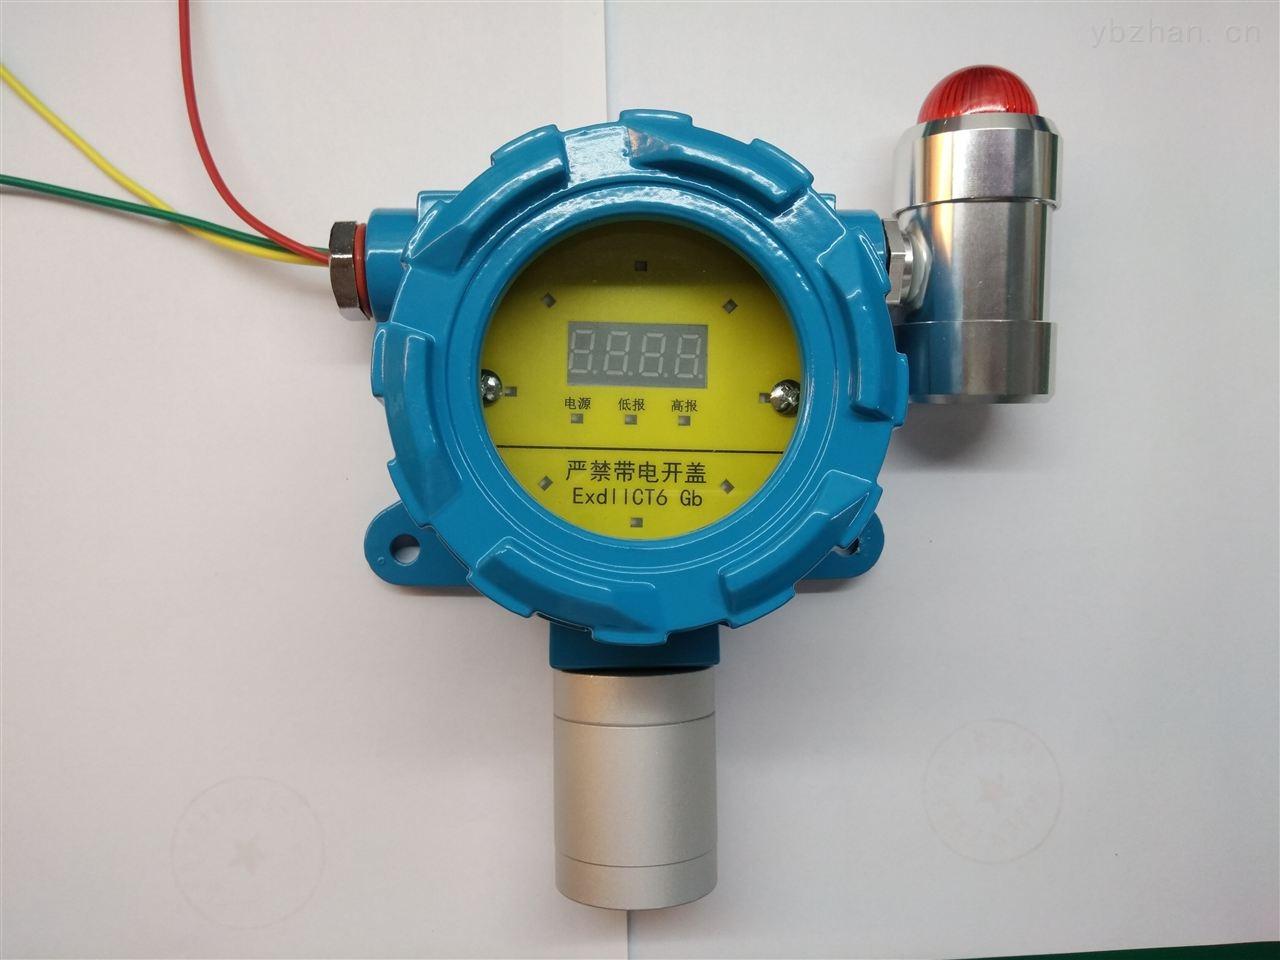 HRP-T1000-一氧化氮报警仪汇瑞埔有毒气体泄漏检测